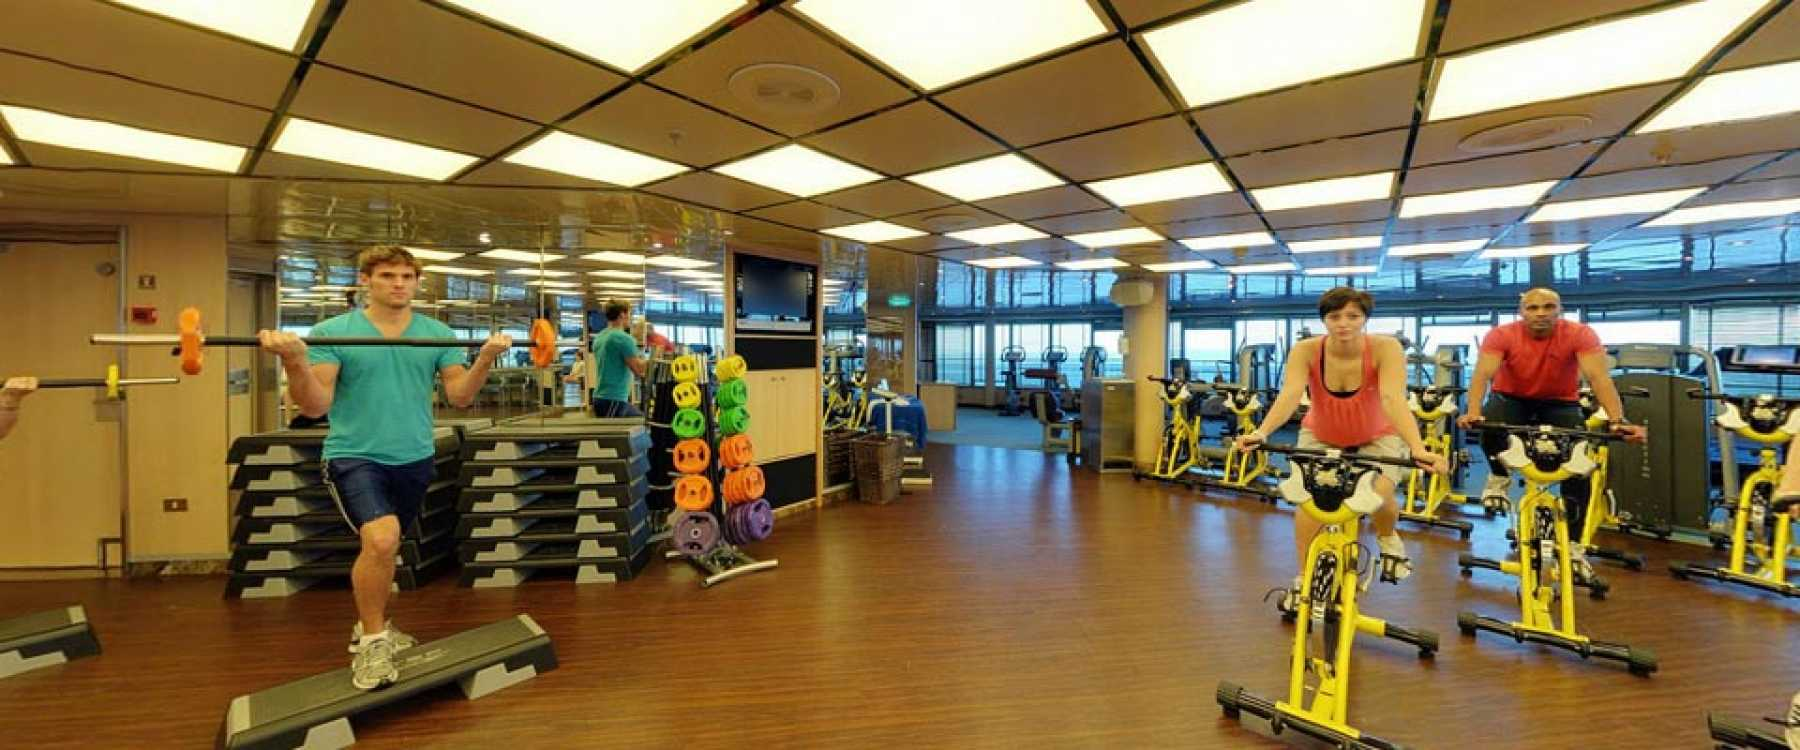 P&O Cruises Ventura Interior Gymnasium 1.jpg